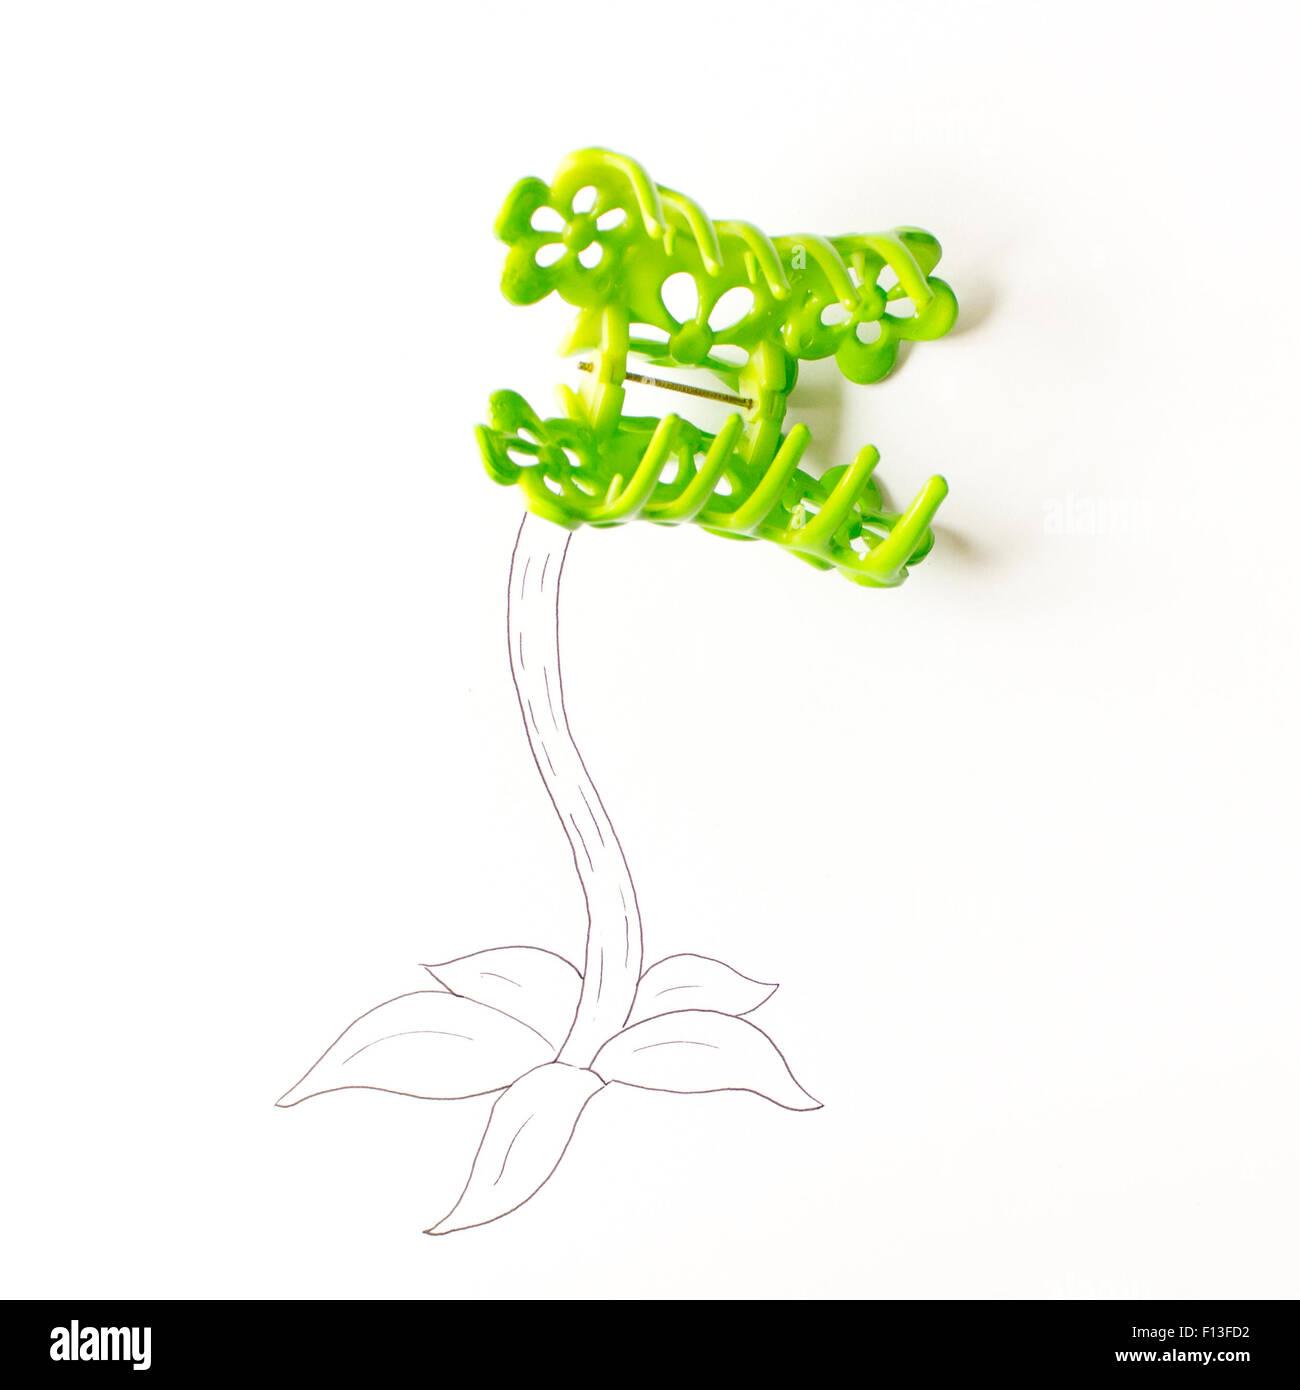 Conceptual drawing of a venus flytrap - Stock Image